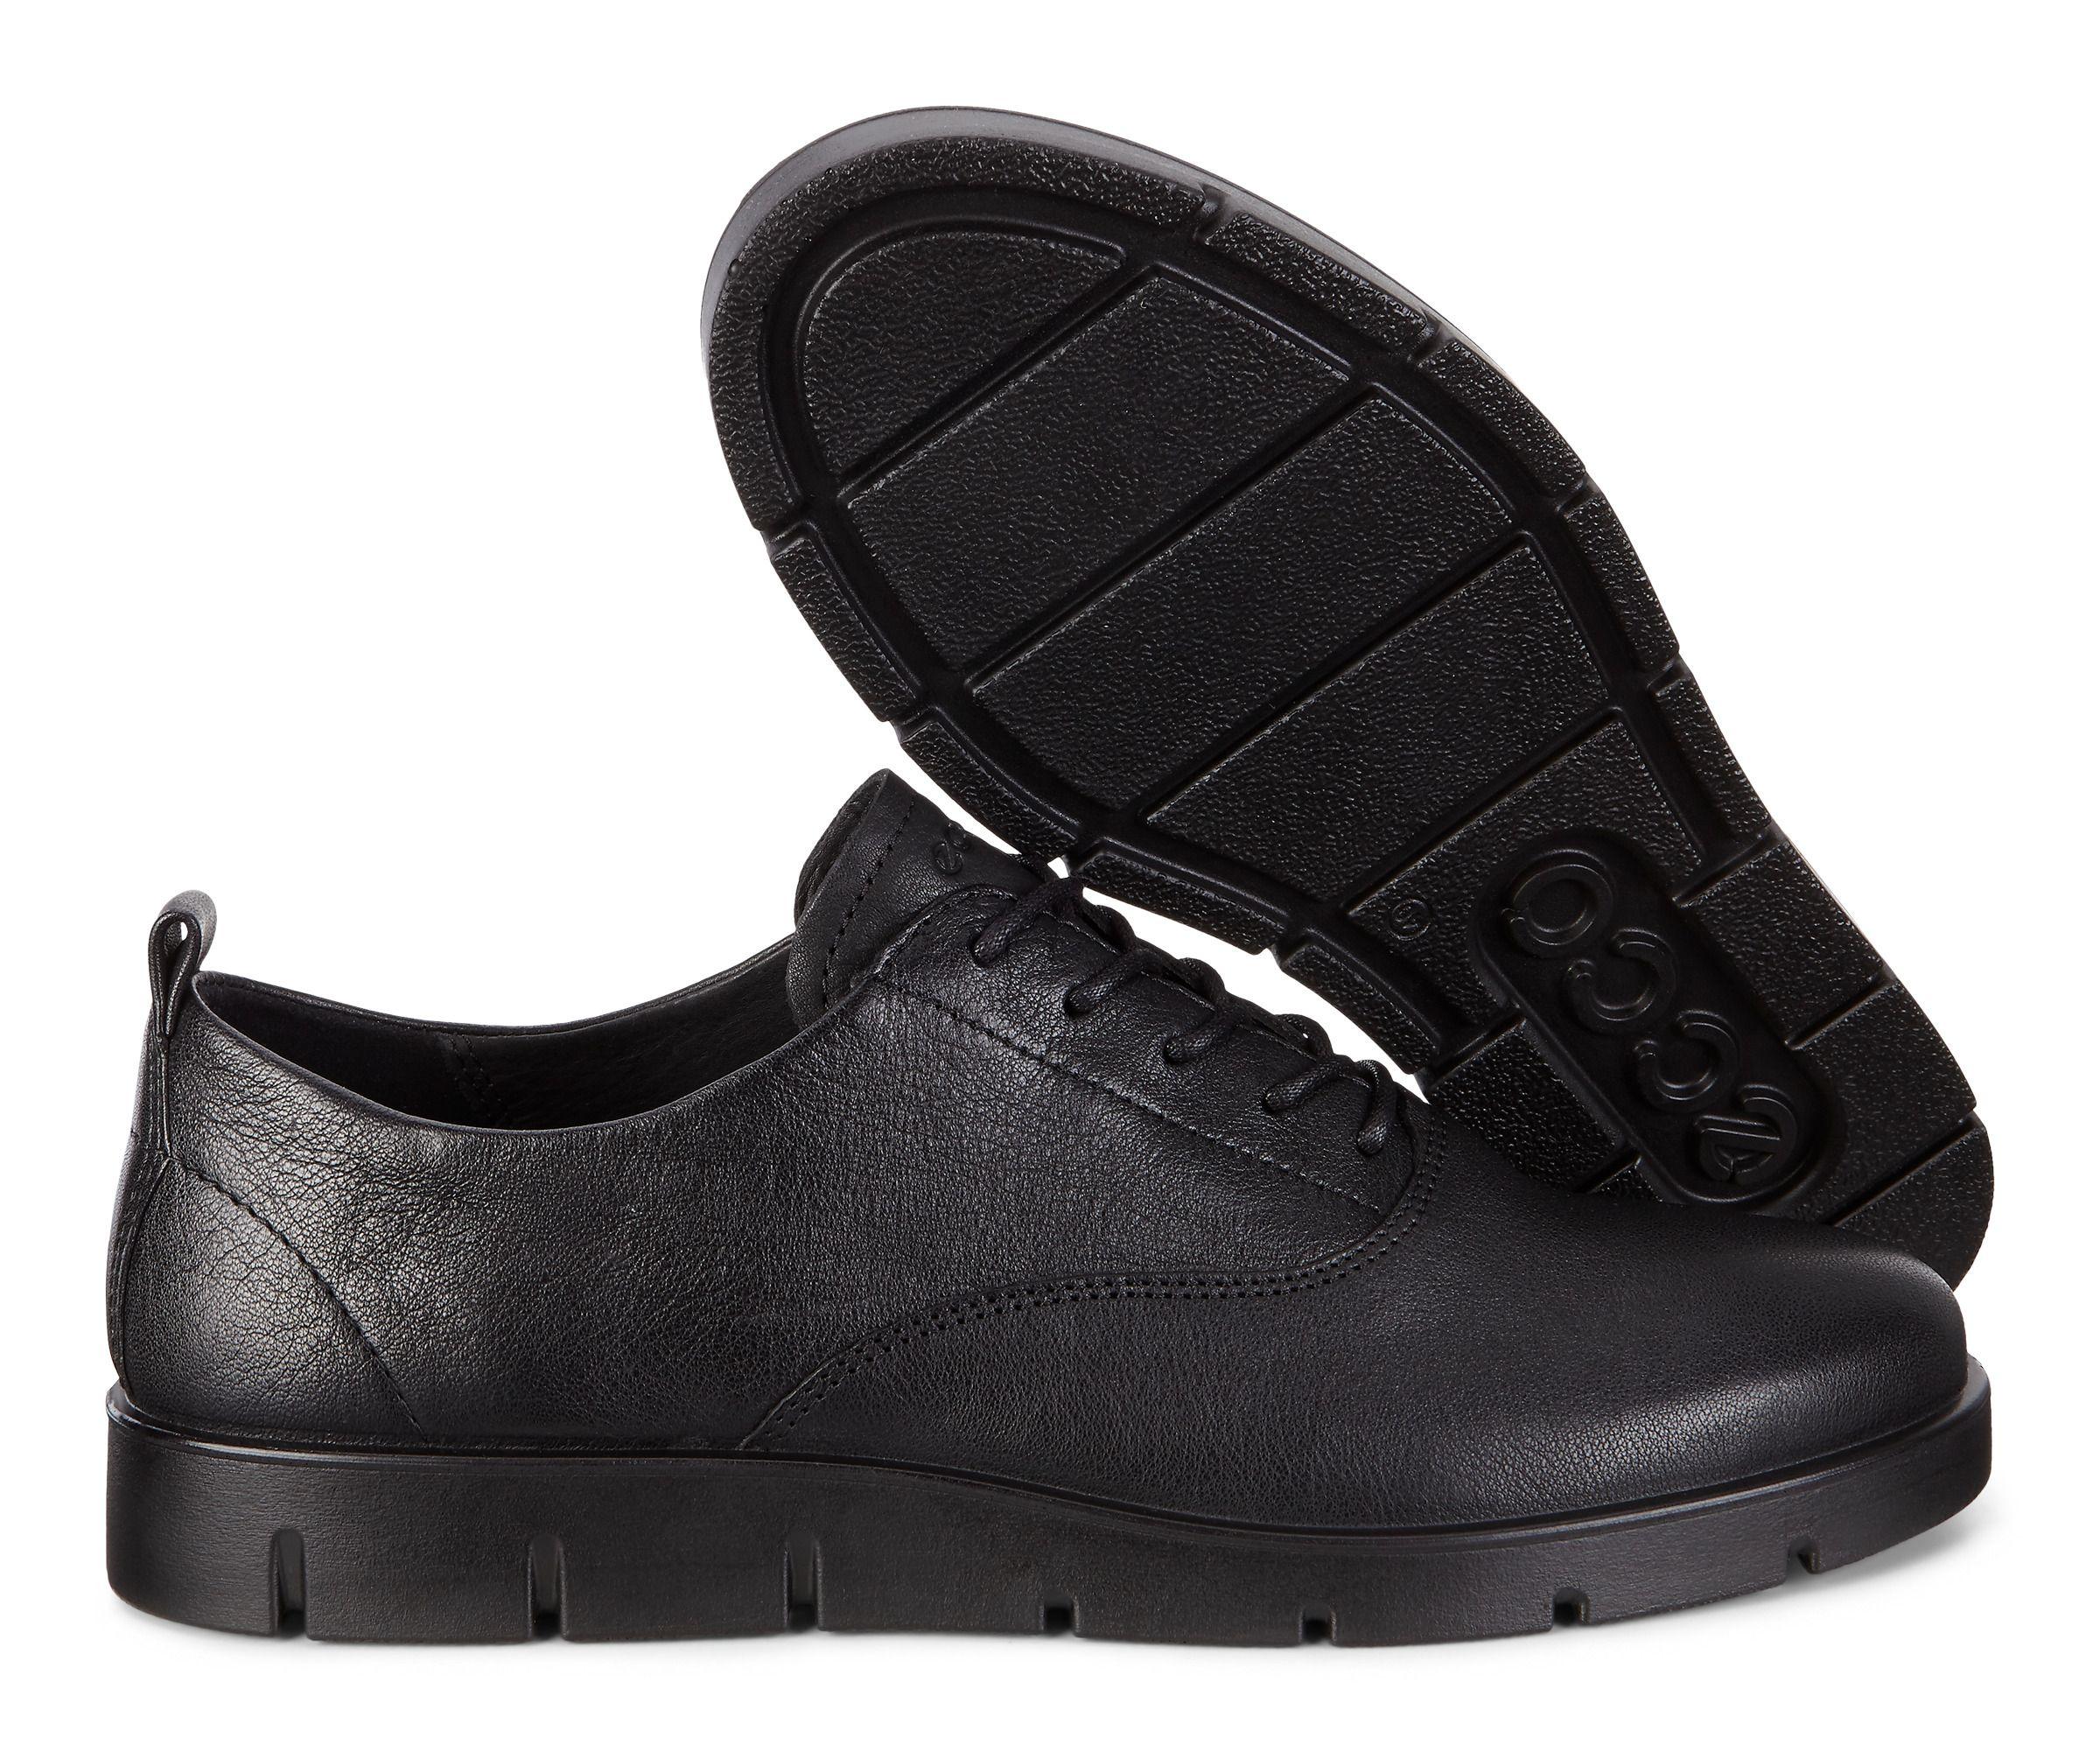 Womens Ecco Bella Flats Shoes In Black | India | (SCH1912)